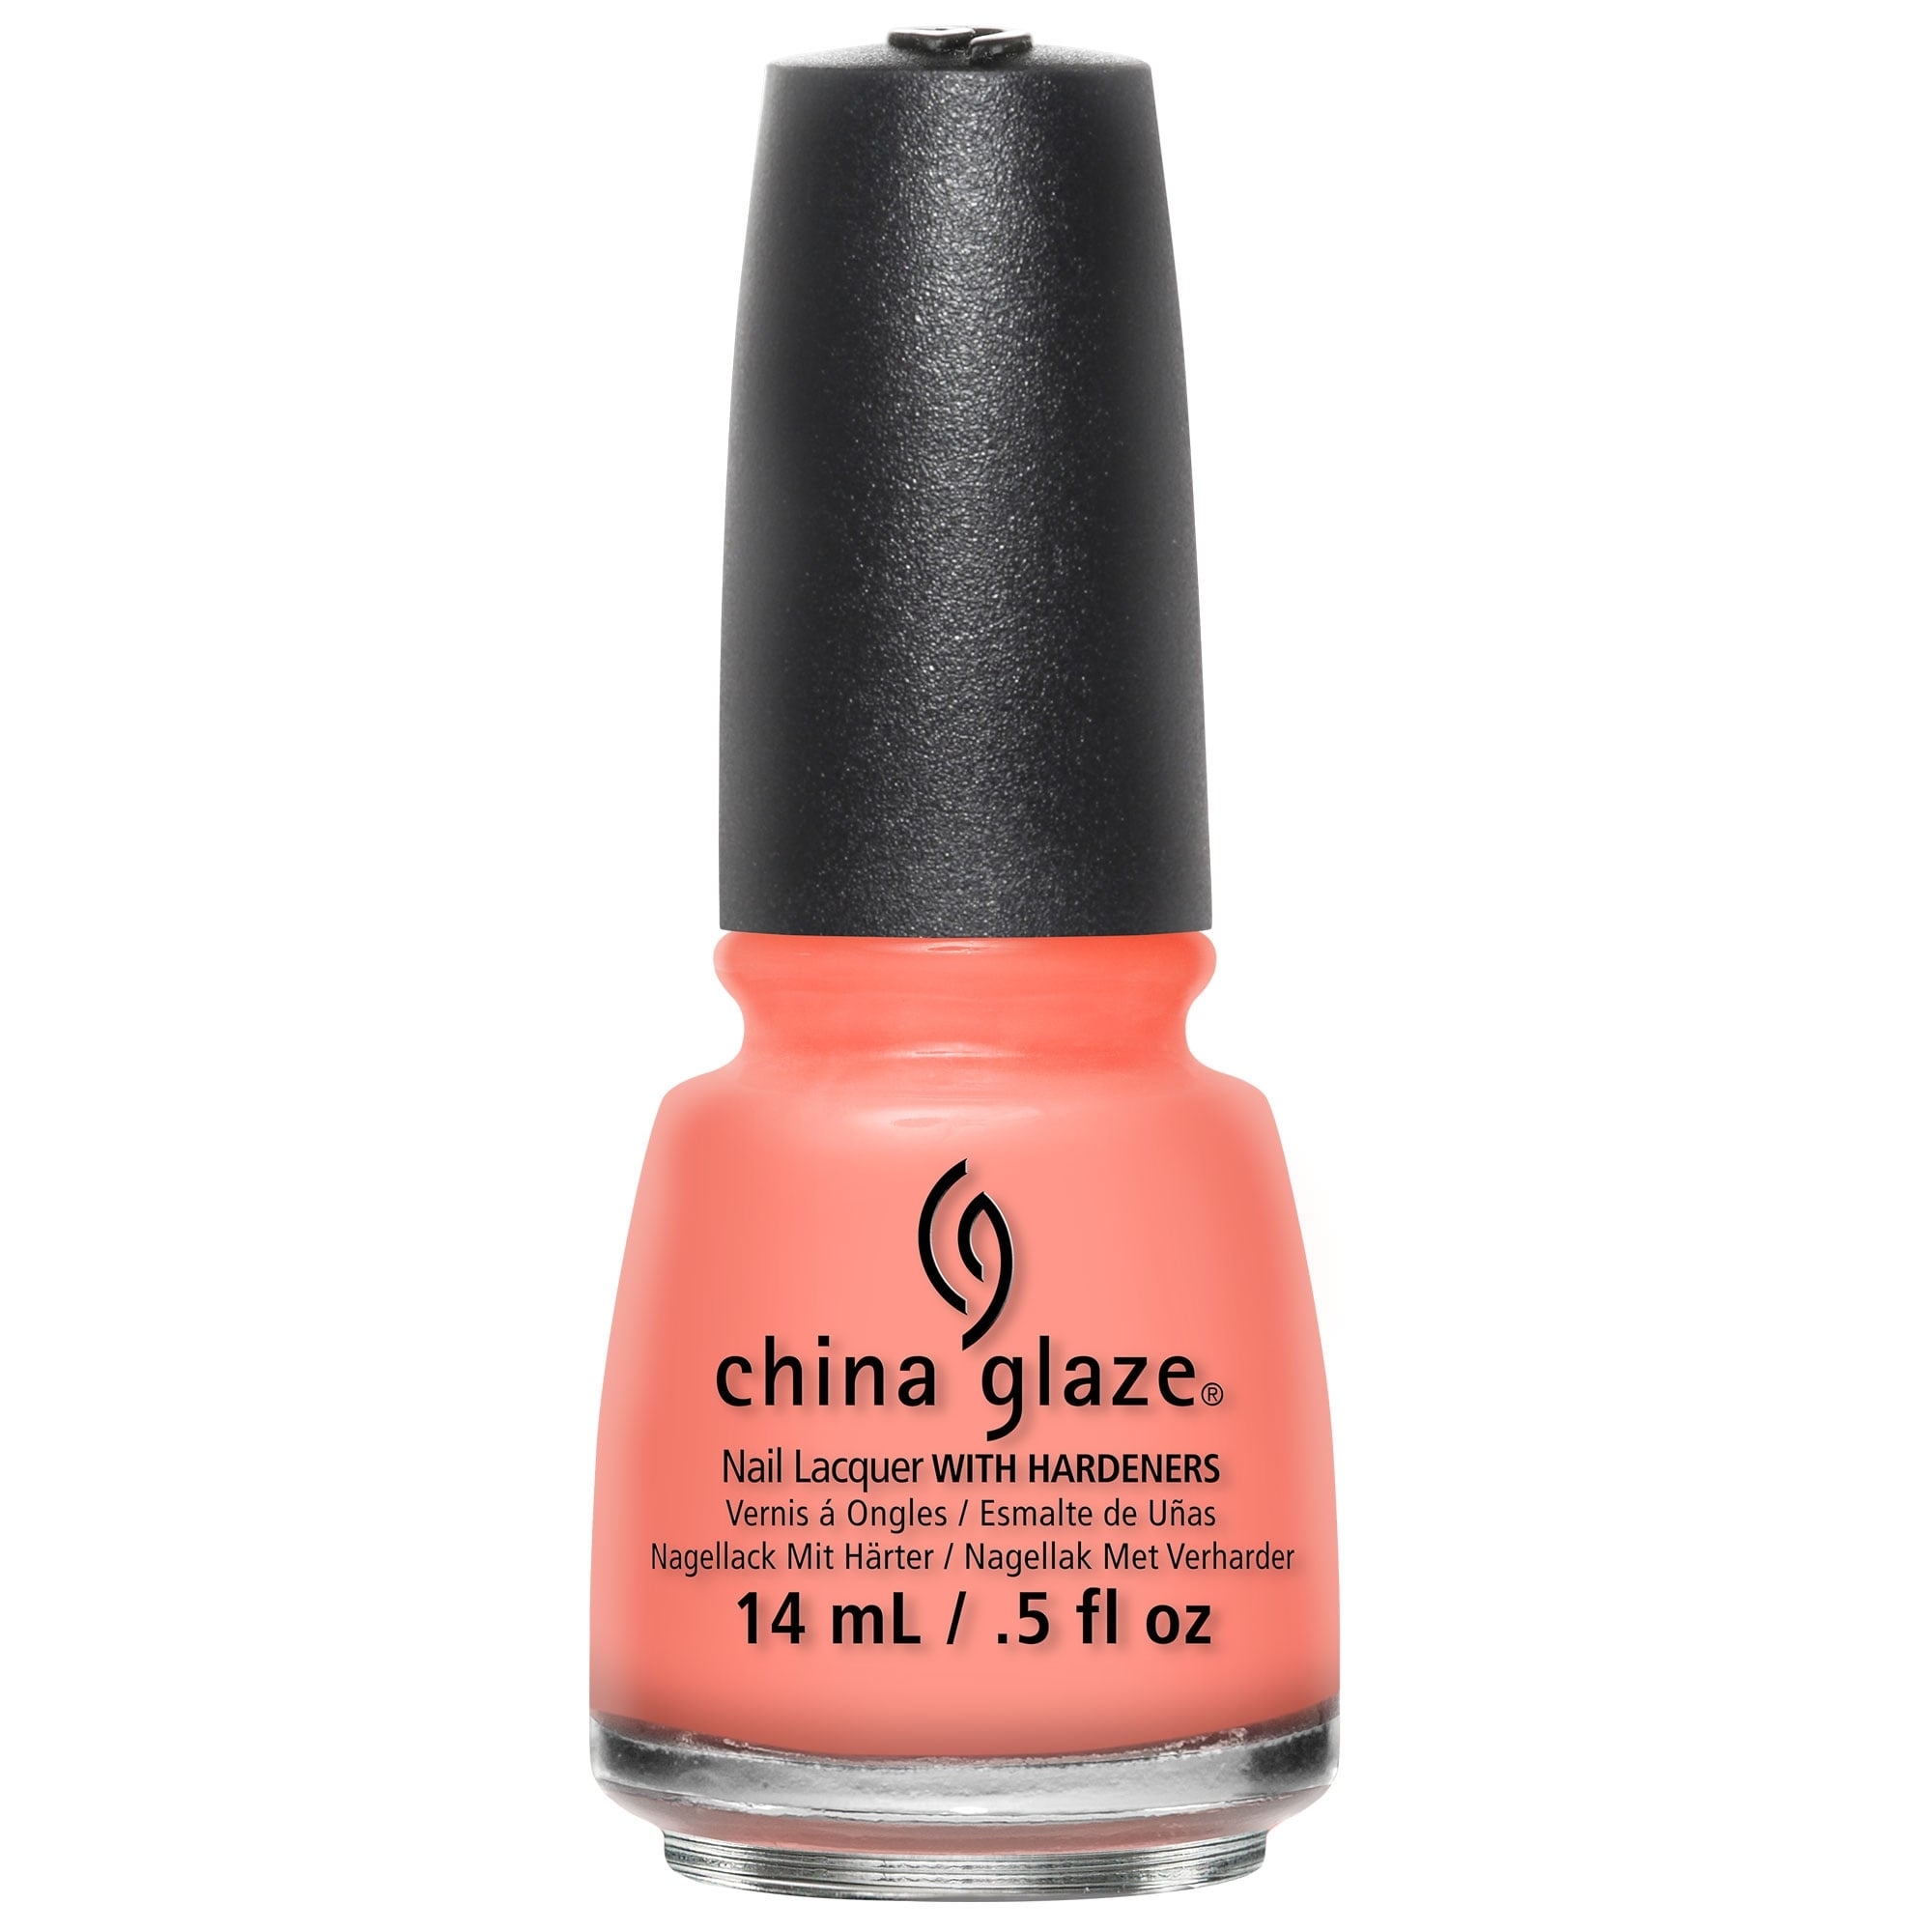 china glaze road trip nail polish collection 2015 more to